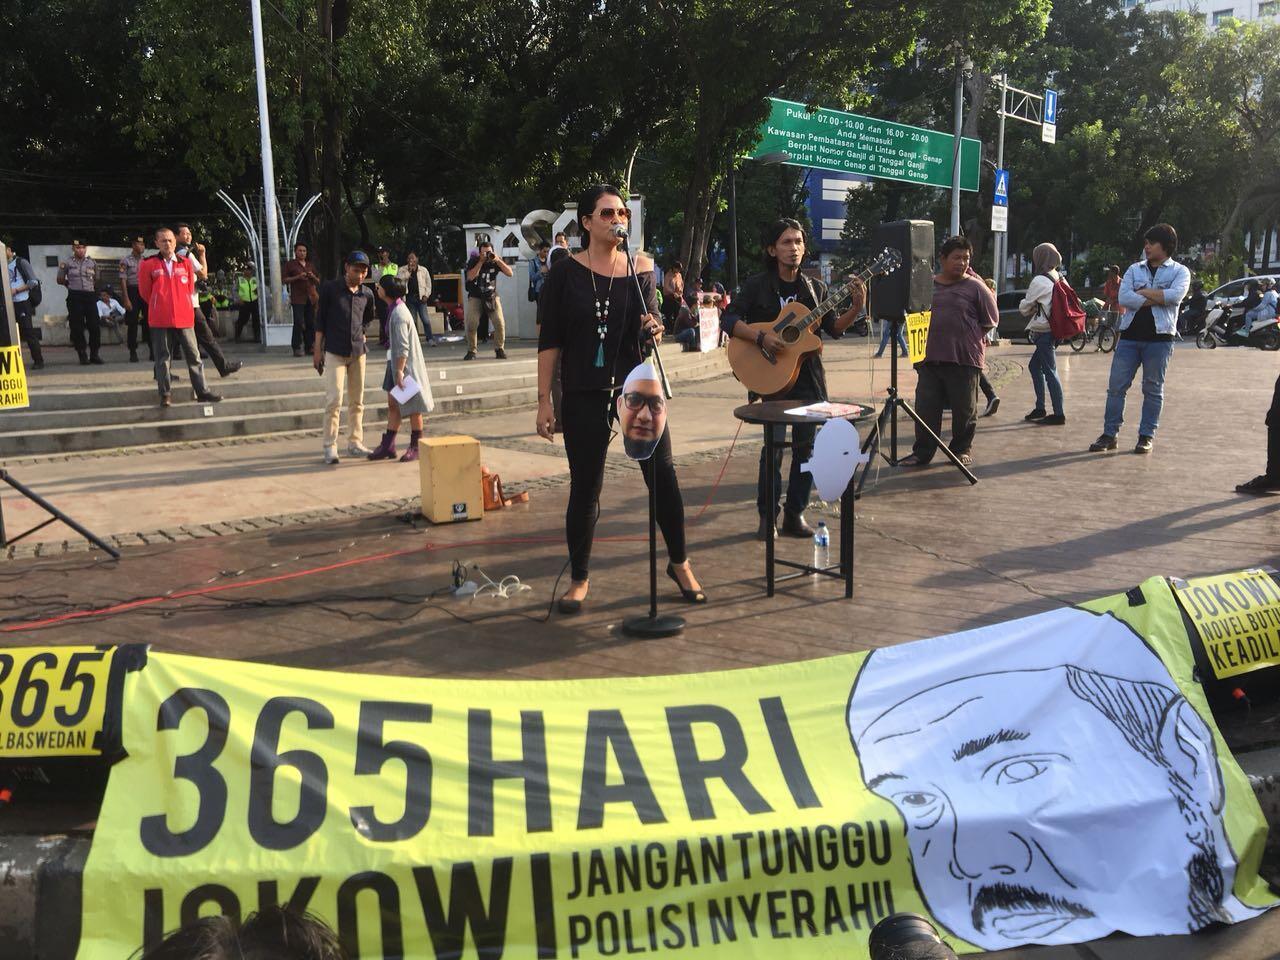 Kuasa Hukum Bantah Novel Baswedan Jadi Penghalang Kasusnya Terungkap